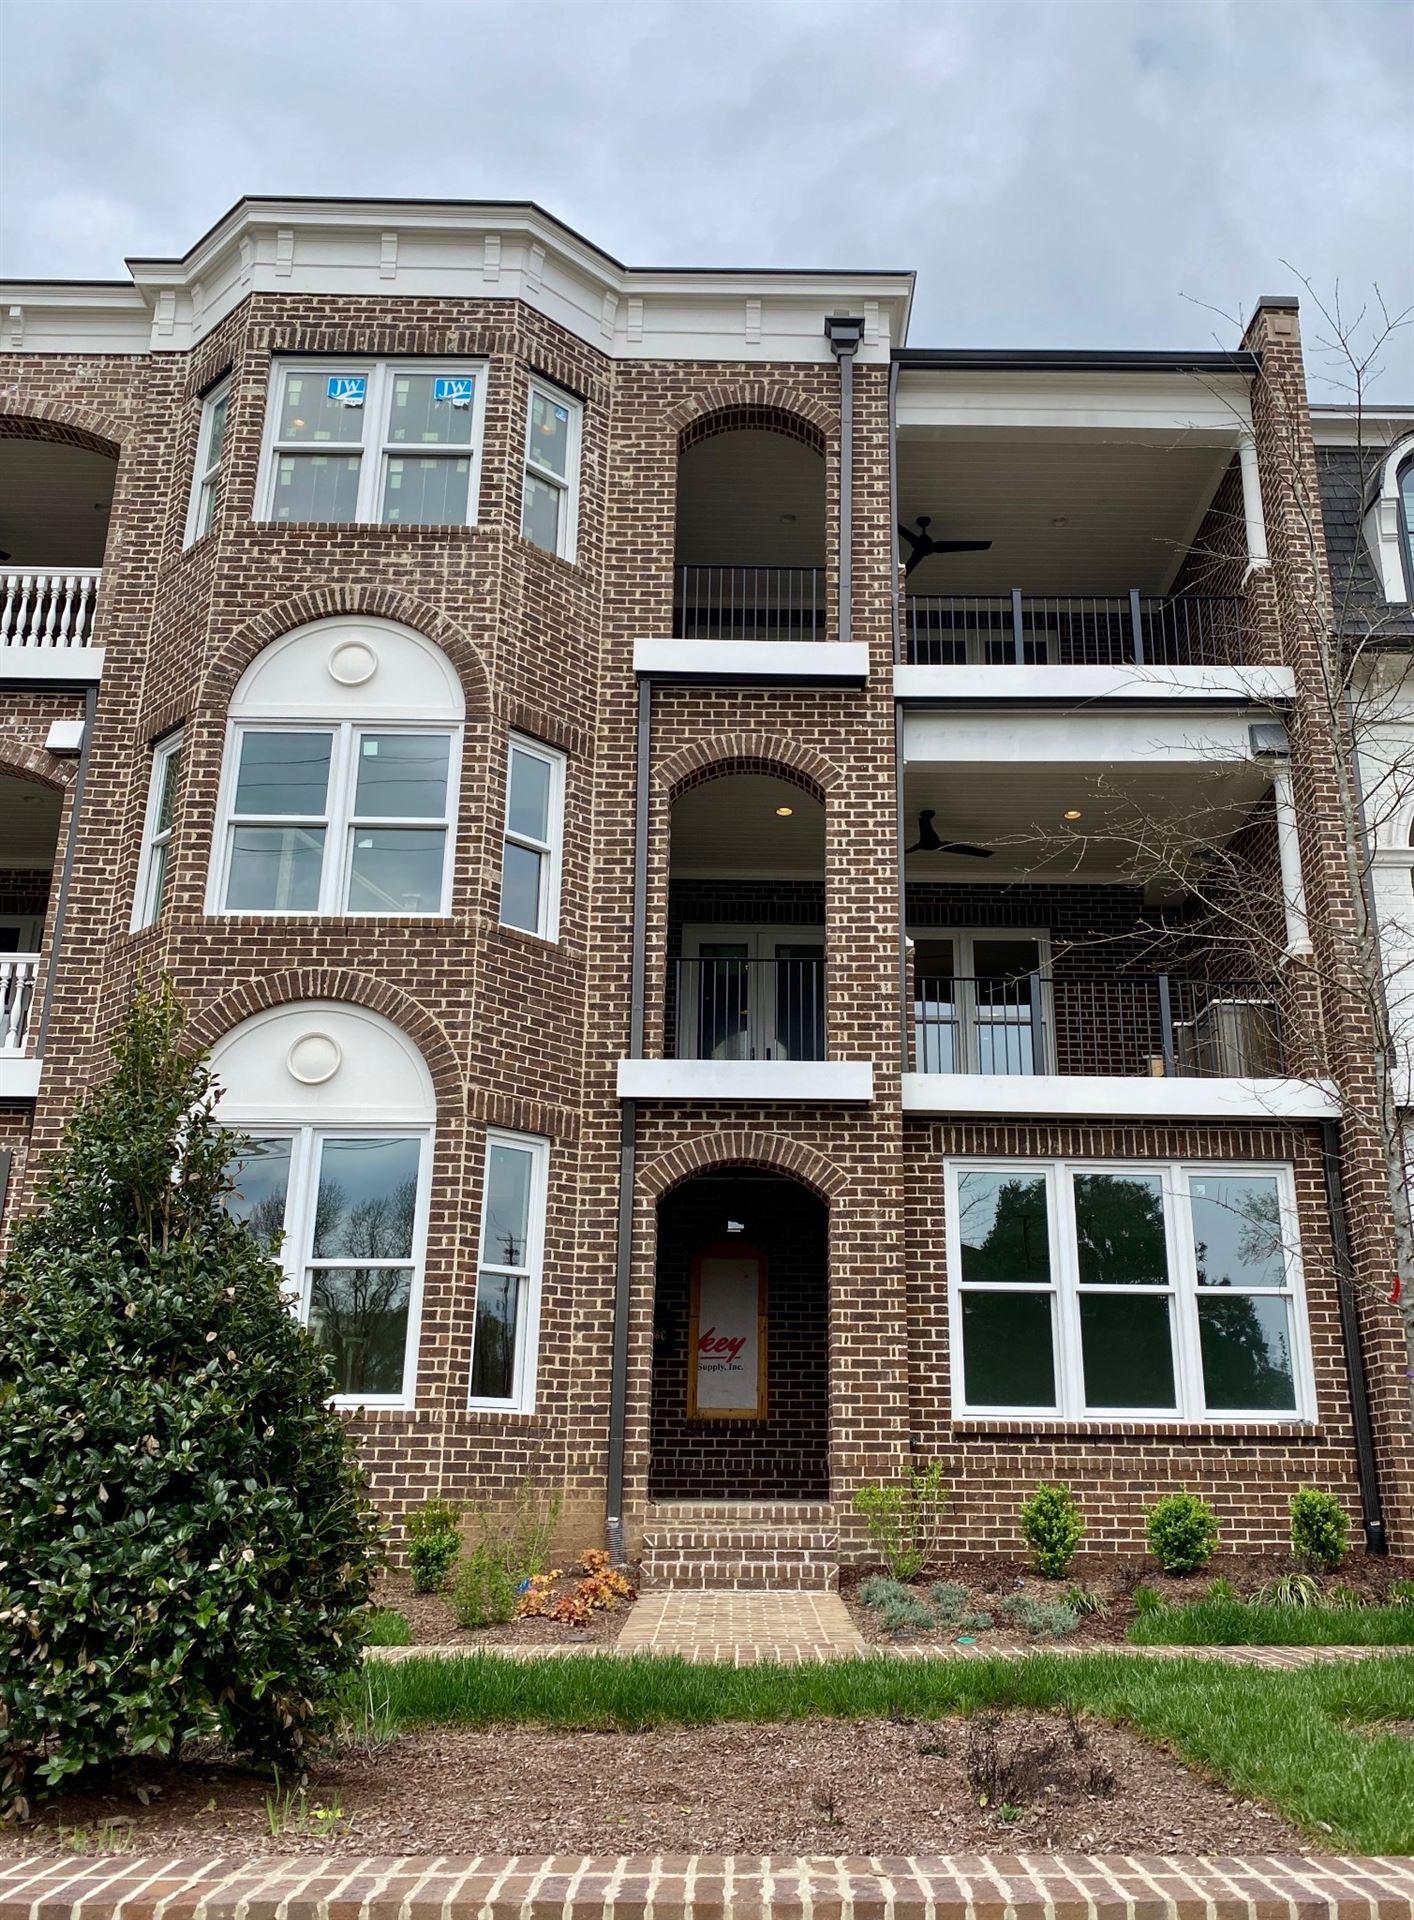 Photo of 3606C West End Ave. (#111), Nashville, TN 37205 (MLS # 2138491)